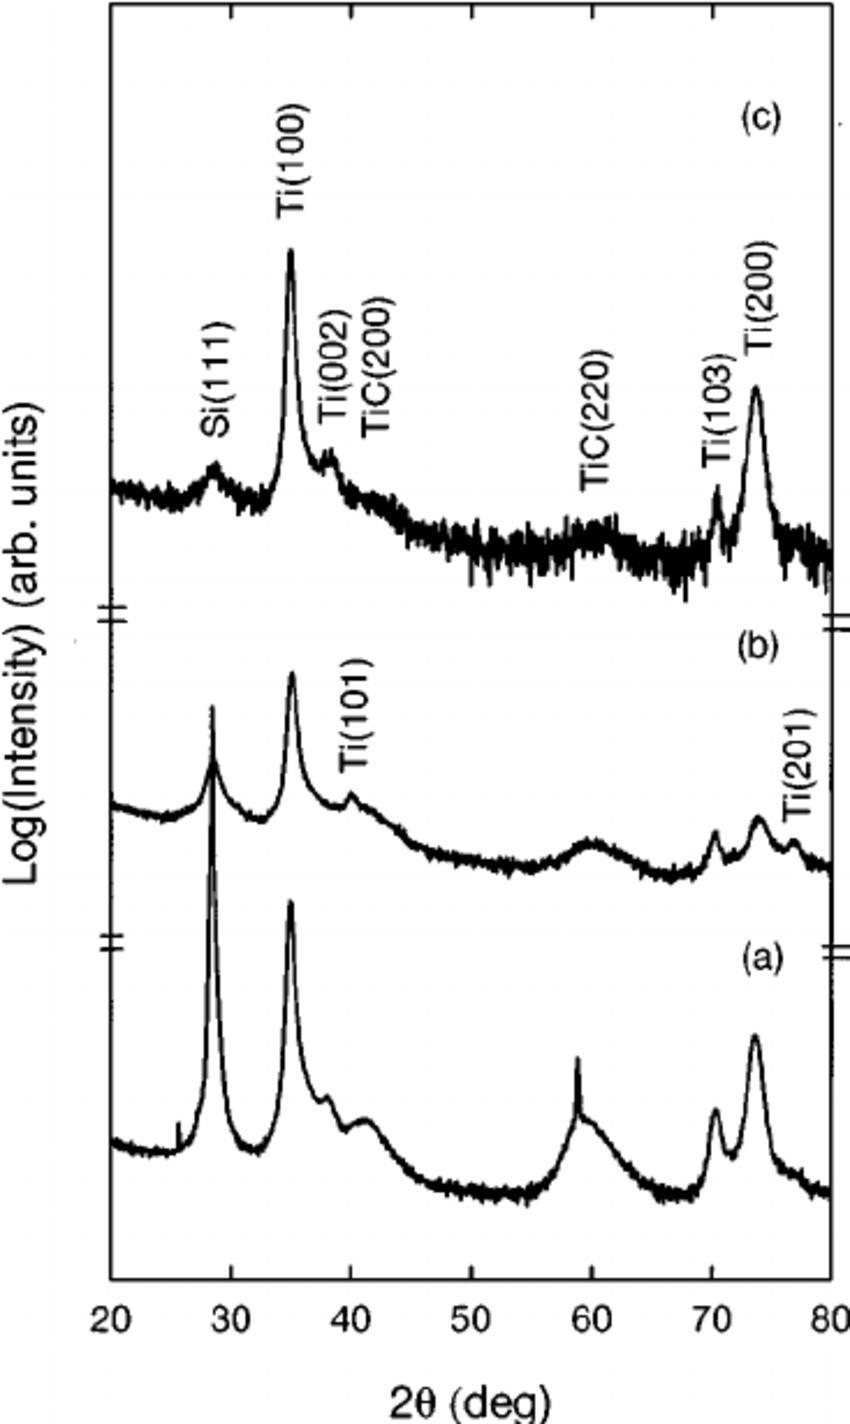 X-ray diffraction patterns of the three Ti-DLC/Ti/Si ͑ 111